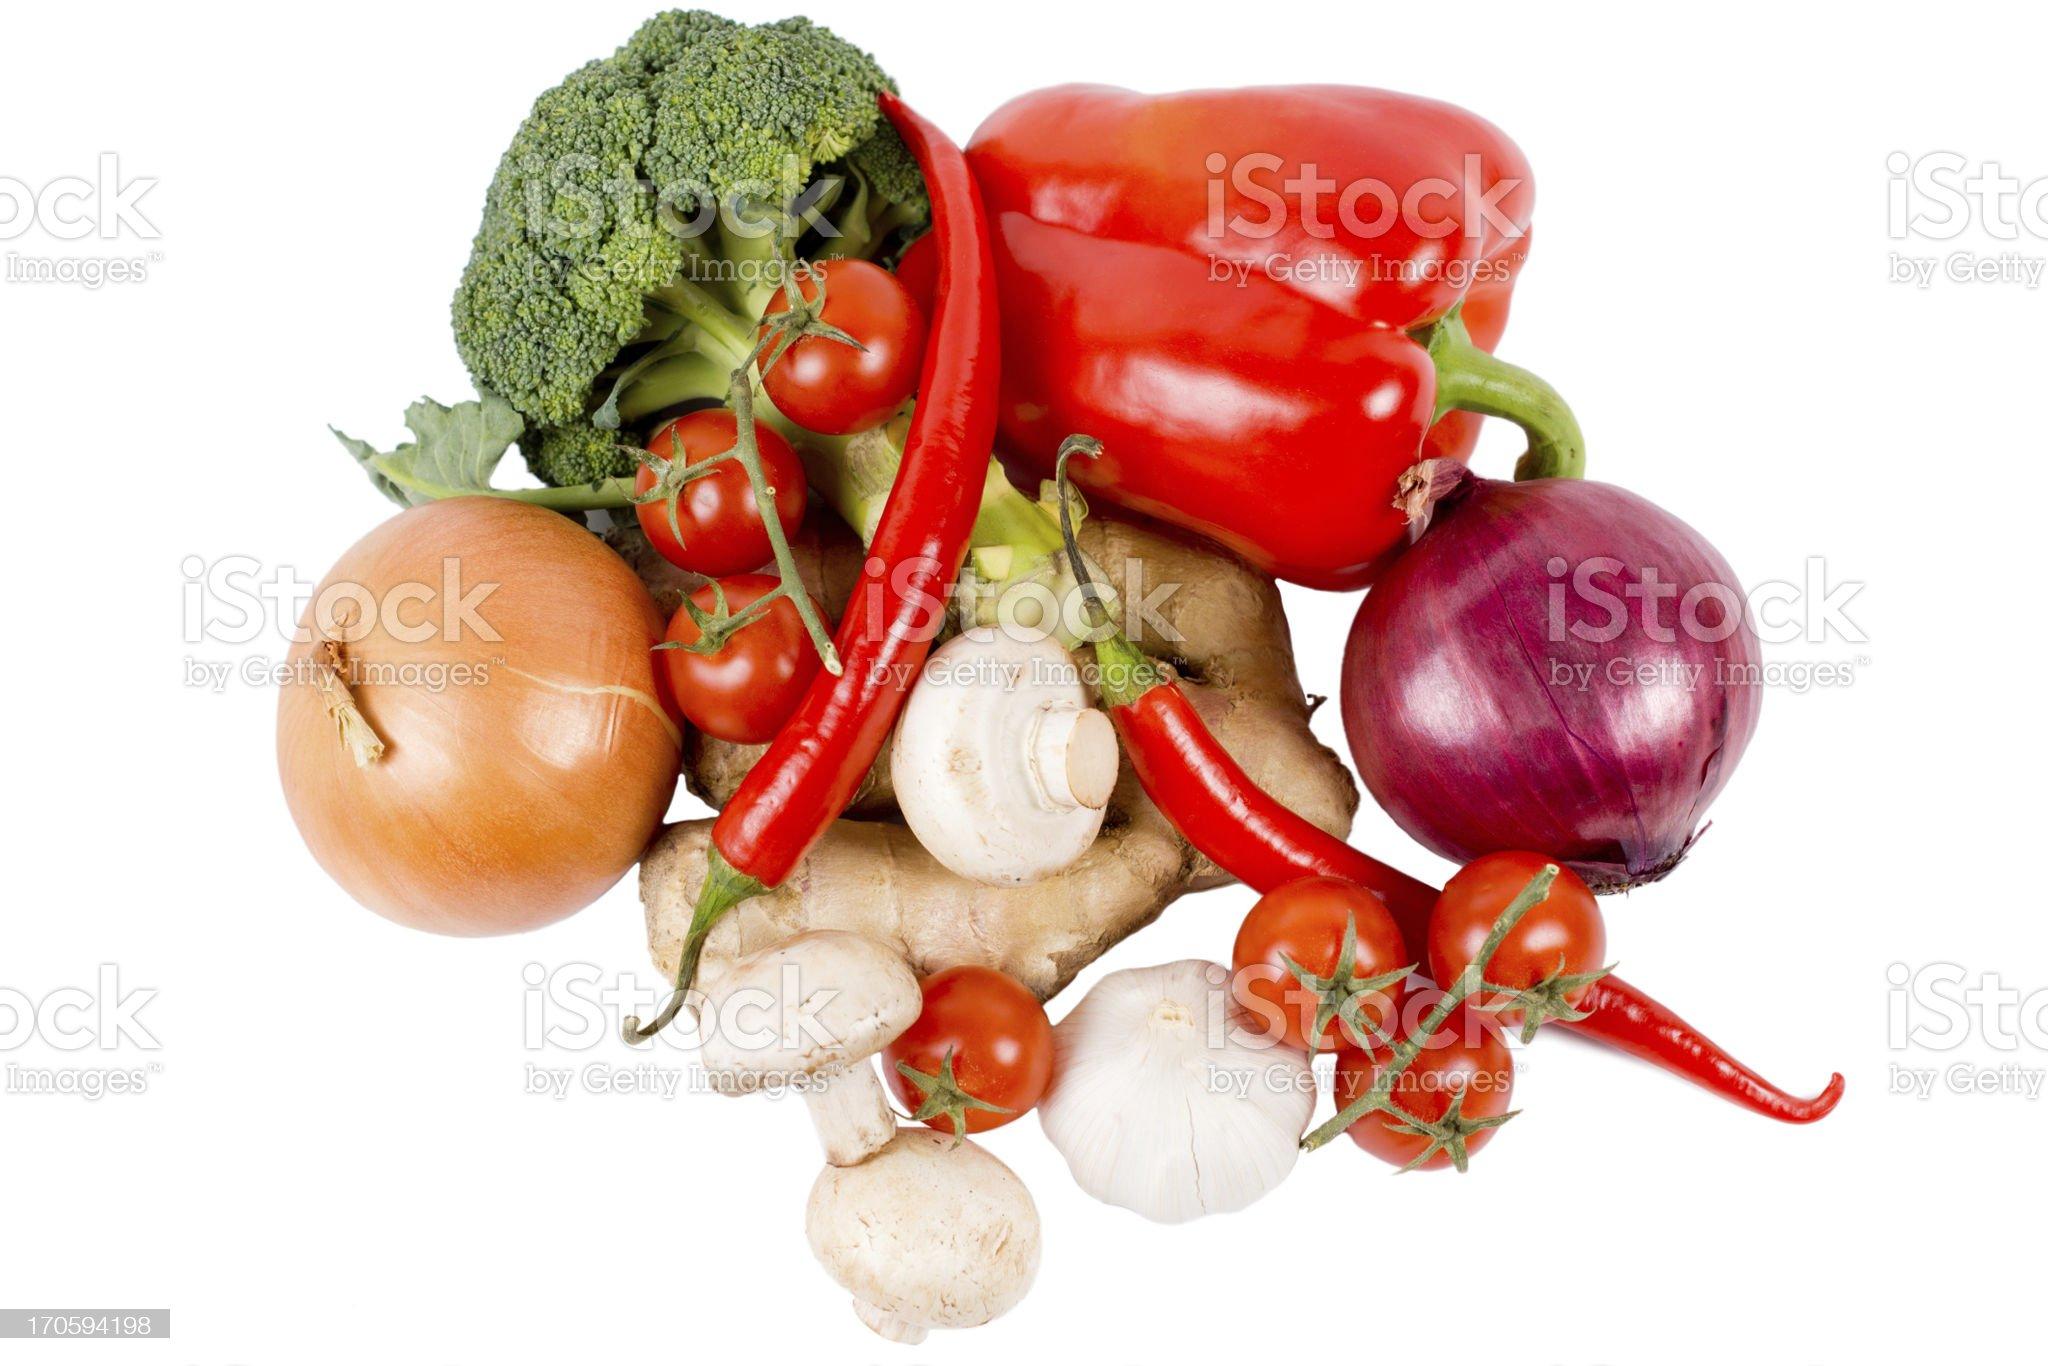 Mixed fresh farm vegetables royalty-free stock photo